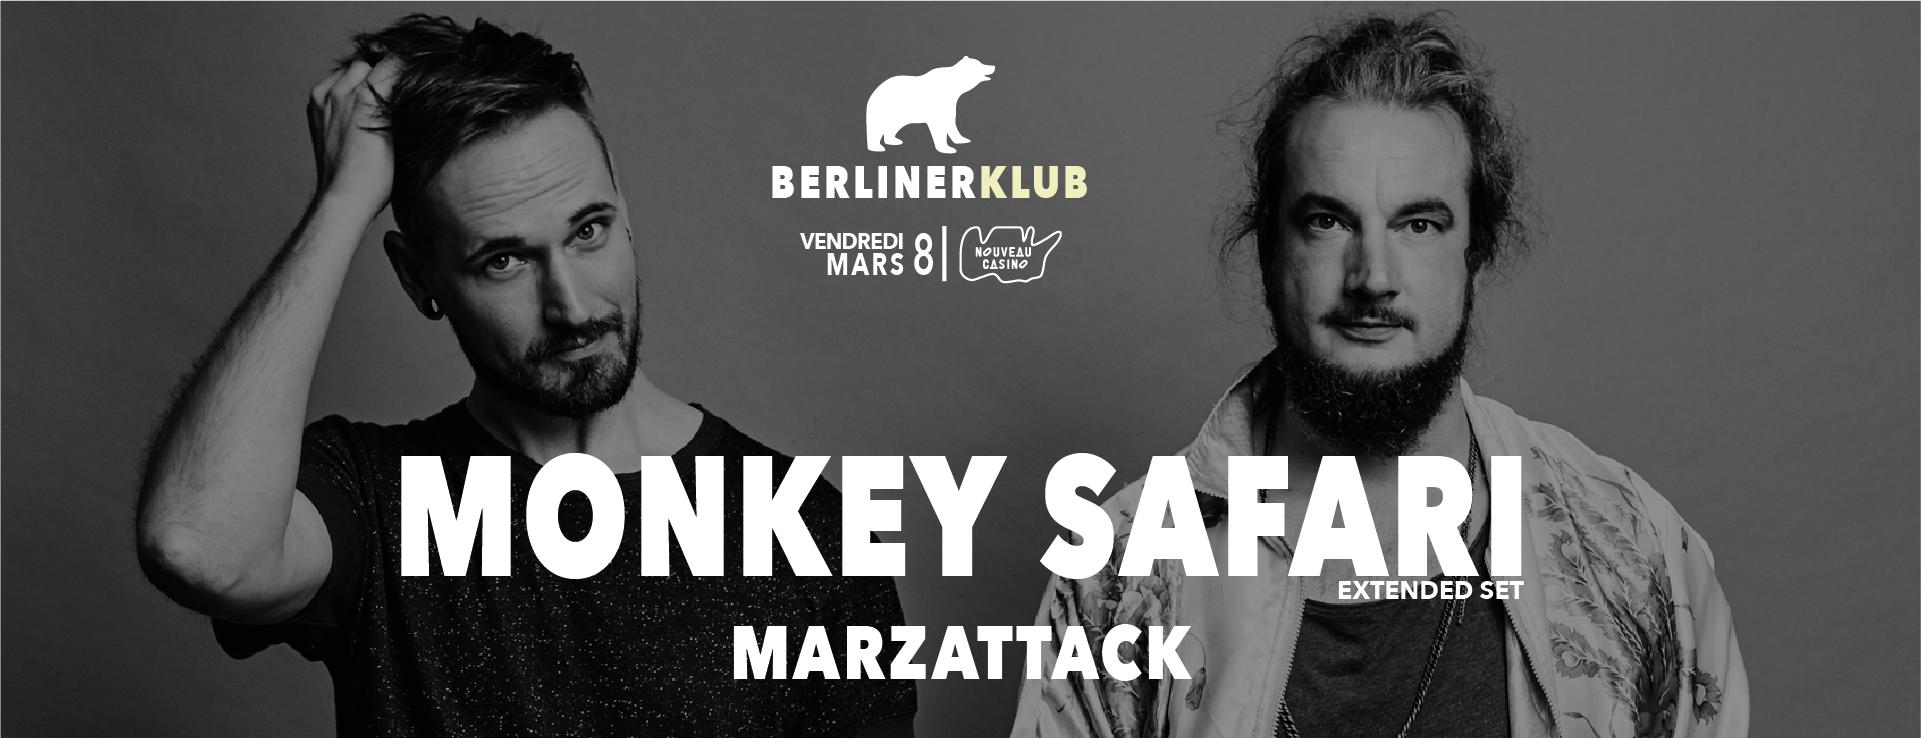 Berliner Klub : Monkey Safari (Extended Set), Marzattack